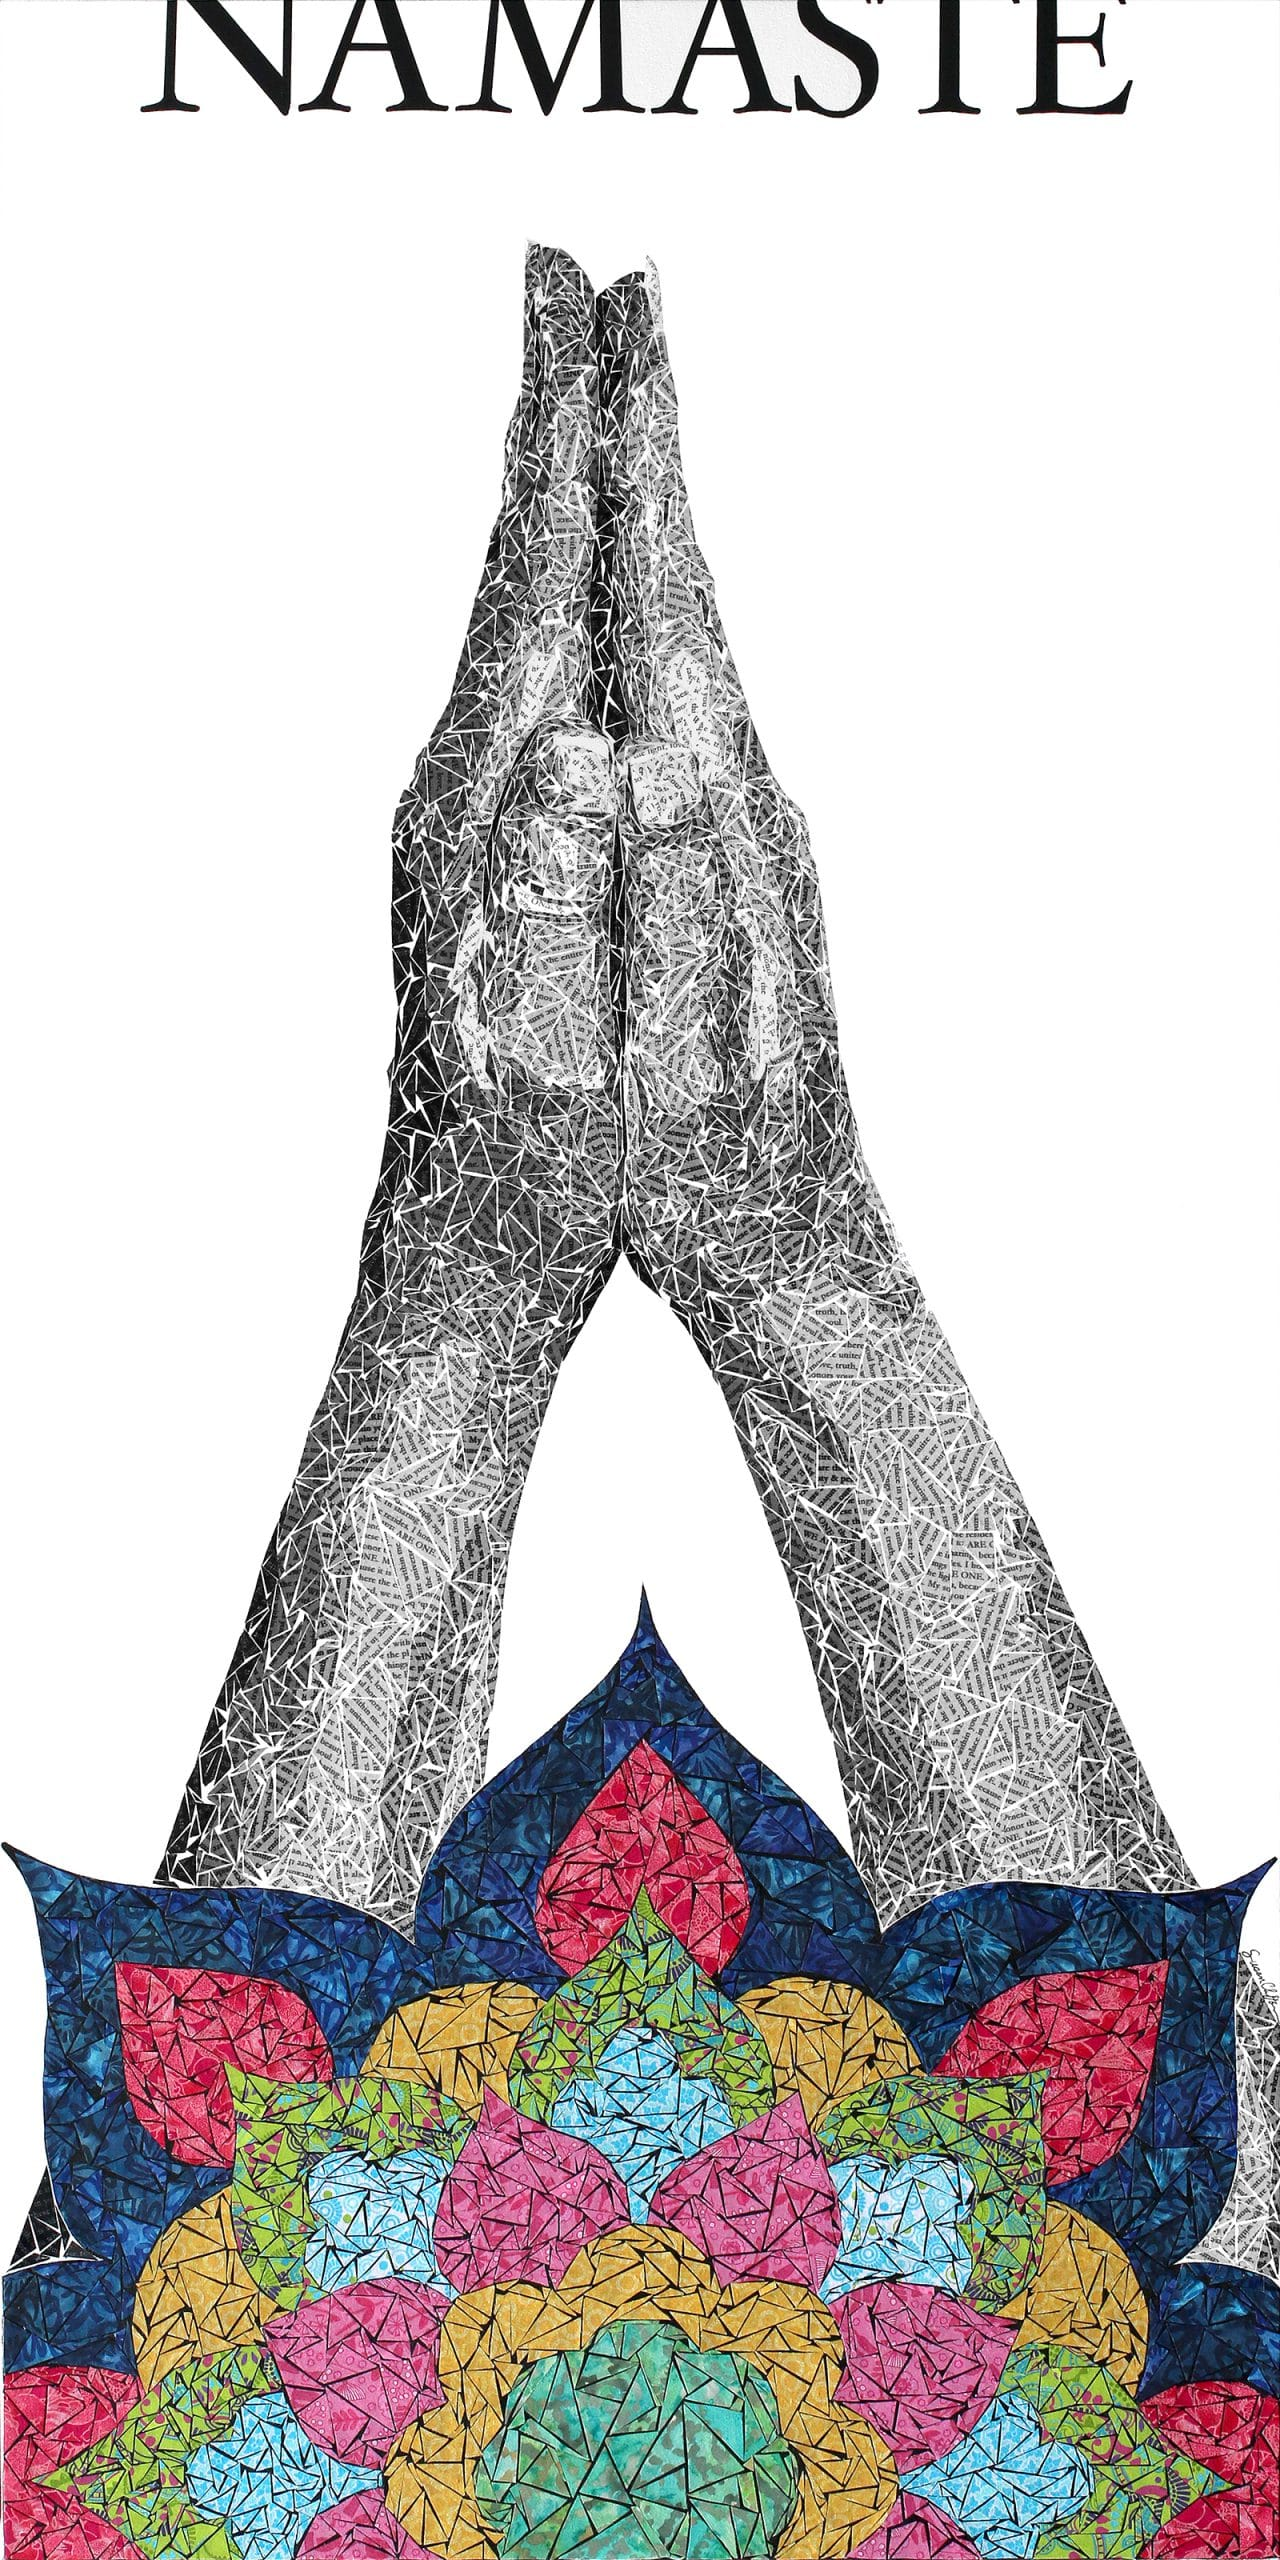 Namaste | Susan Clifton | 30x60